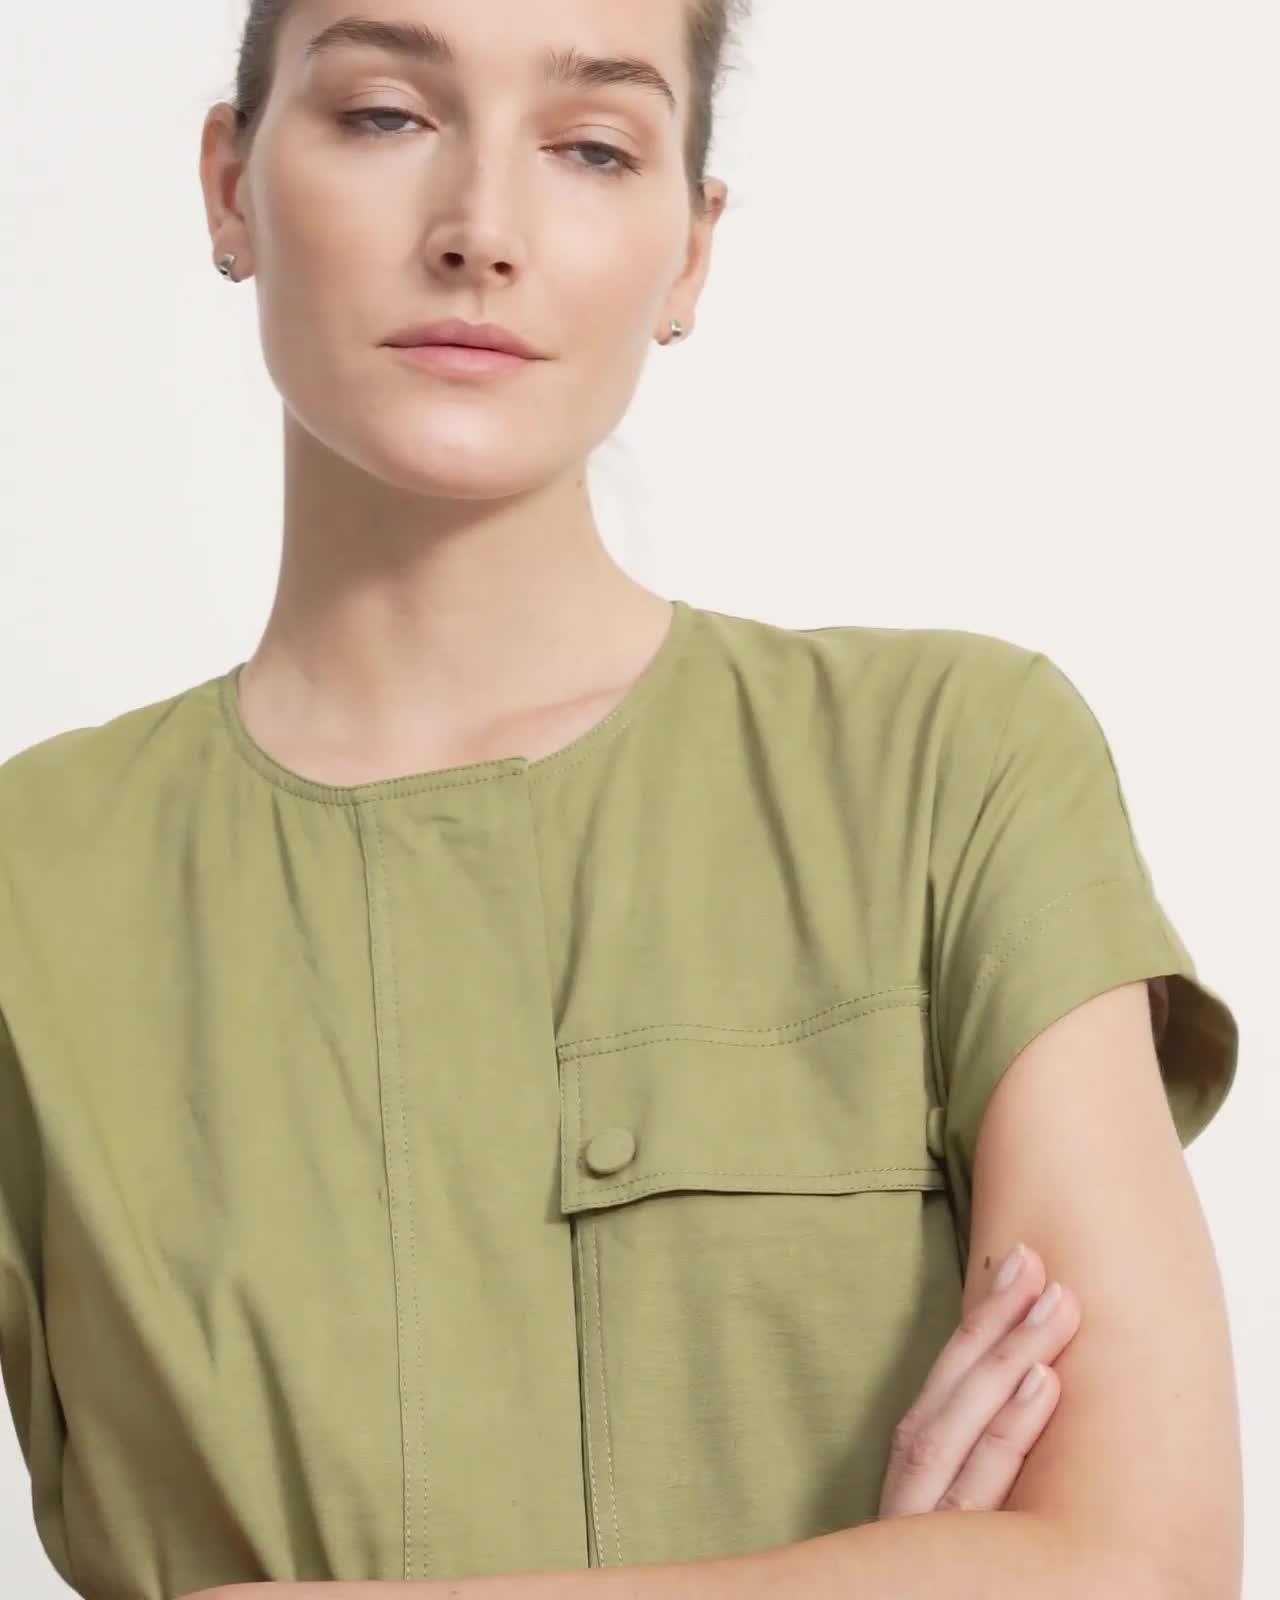 Crewneck Utility Dress in Good Linen